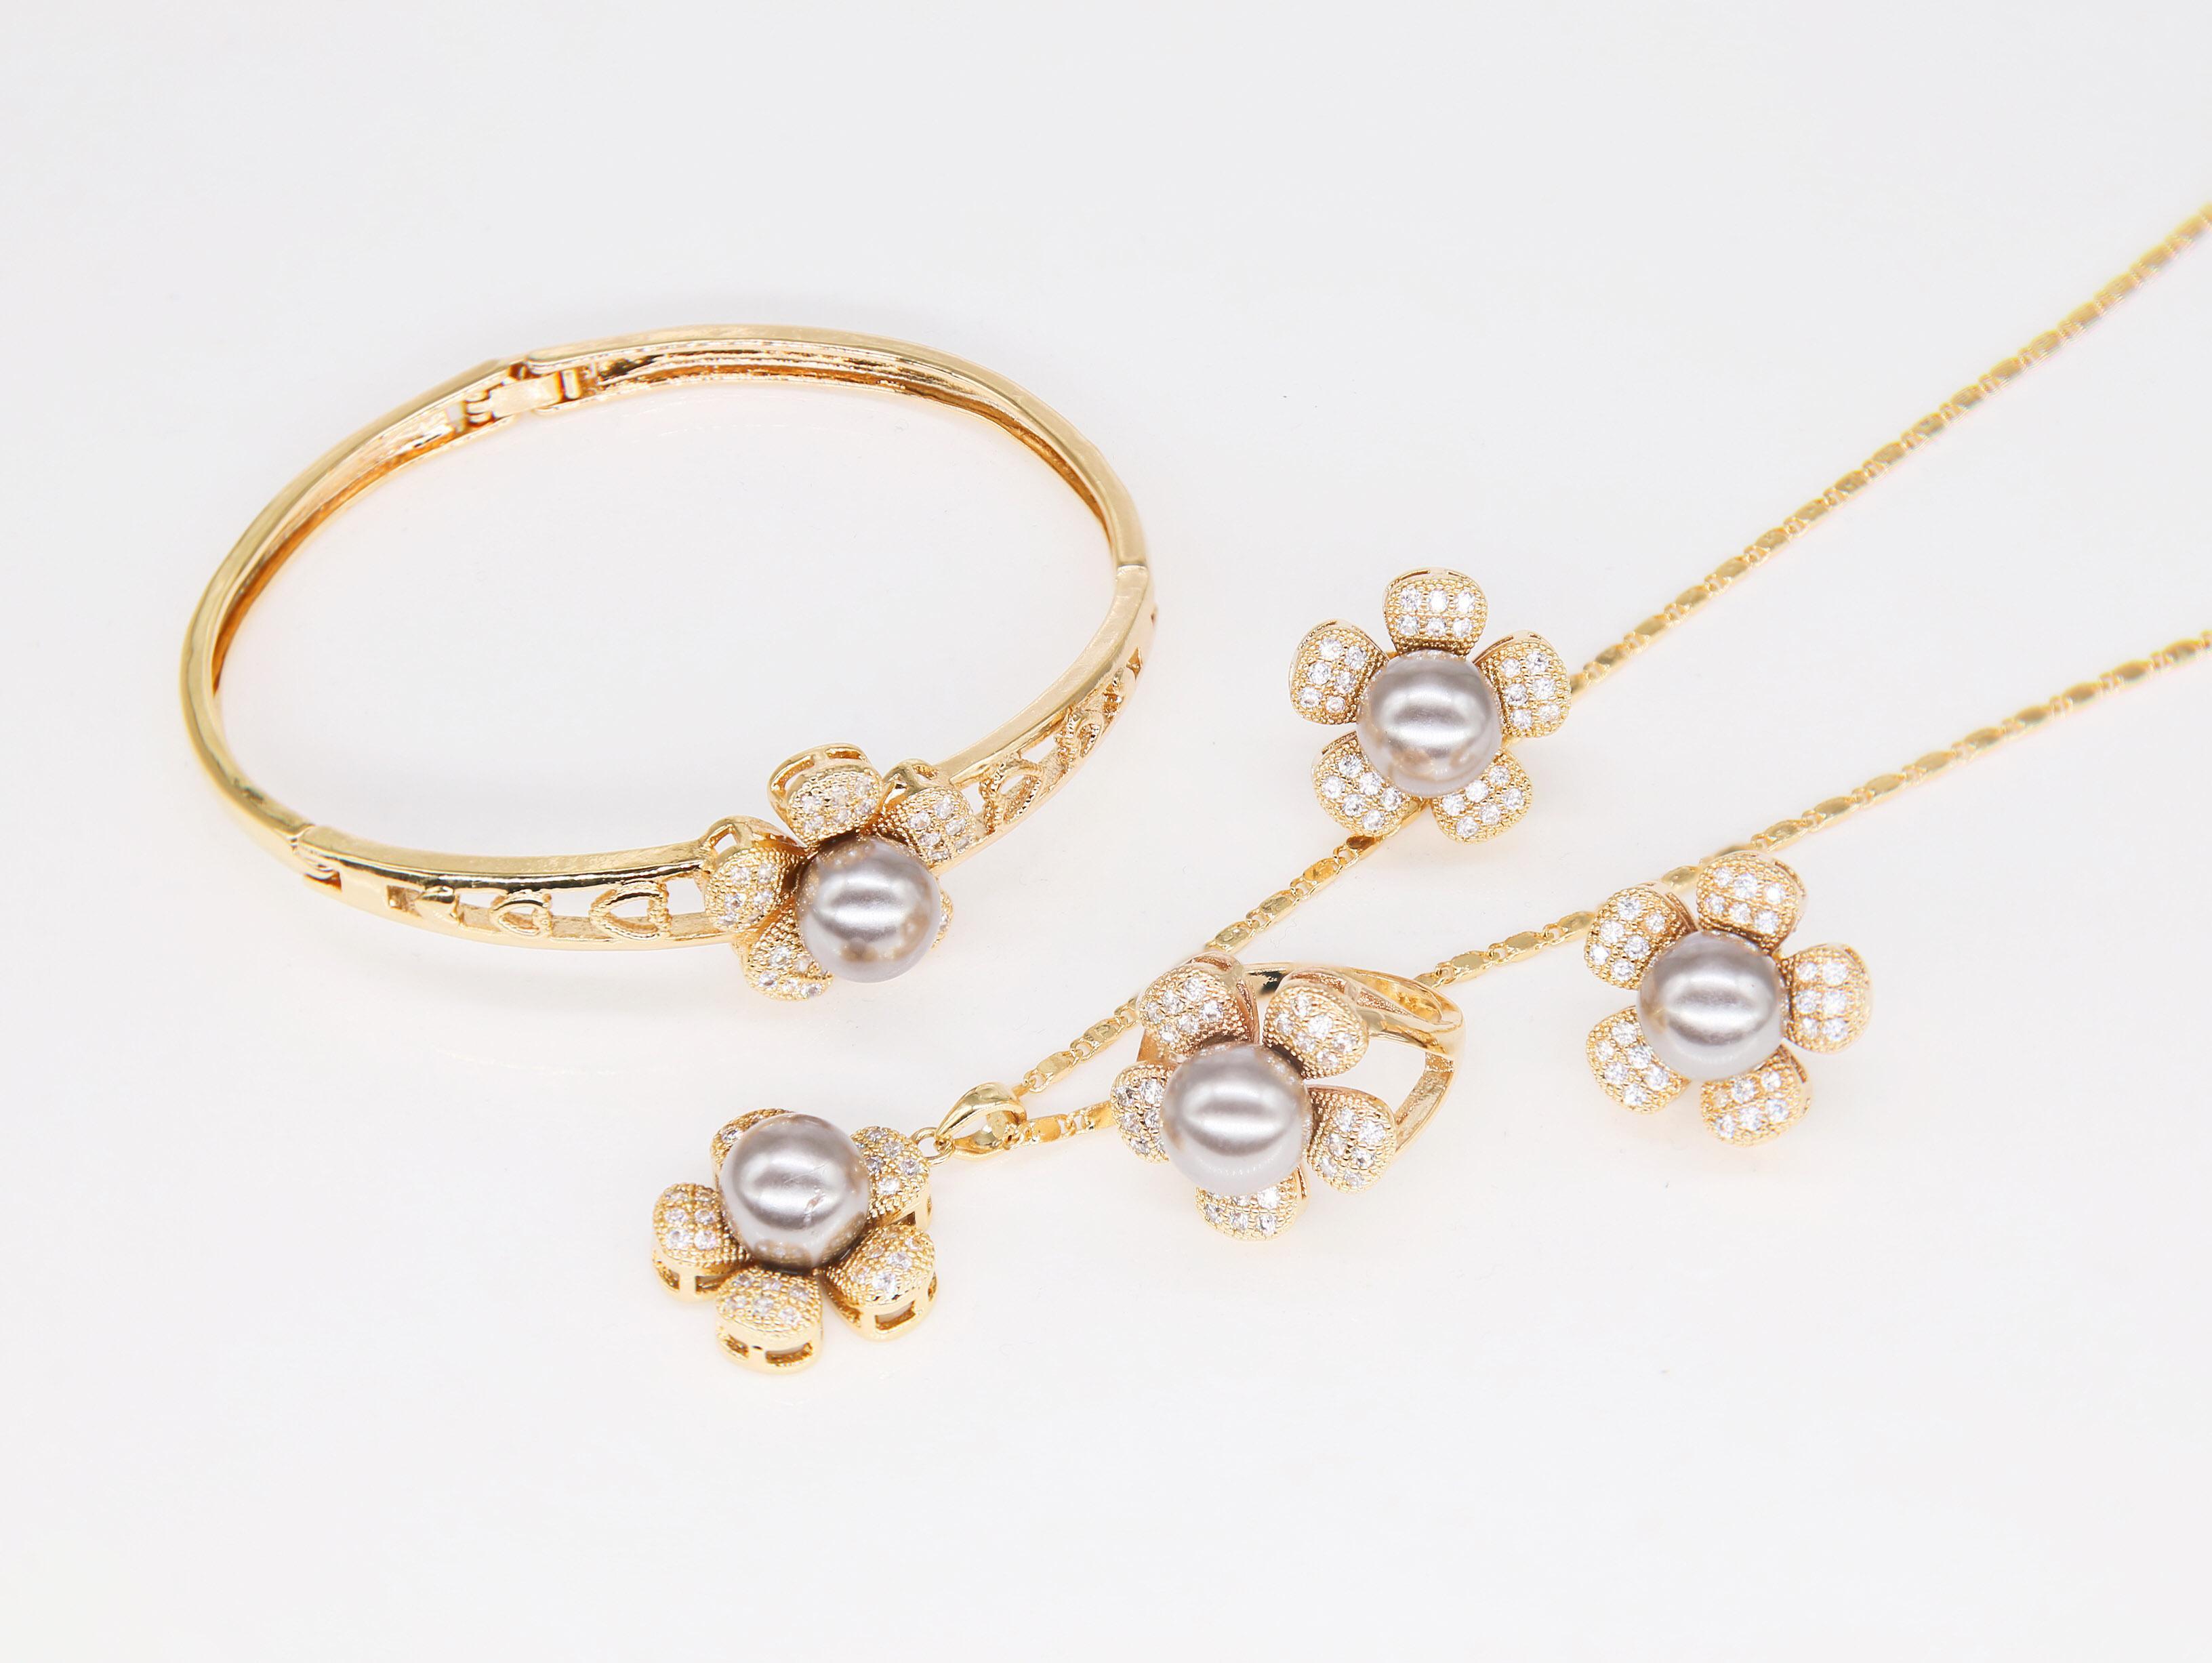 63a2388e6 DS Korea design style party wedding fashion luxury ladies flower pearl  necklace,ring,bracelet